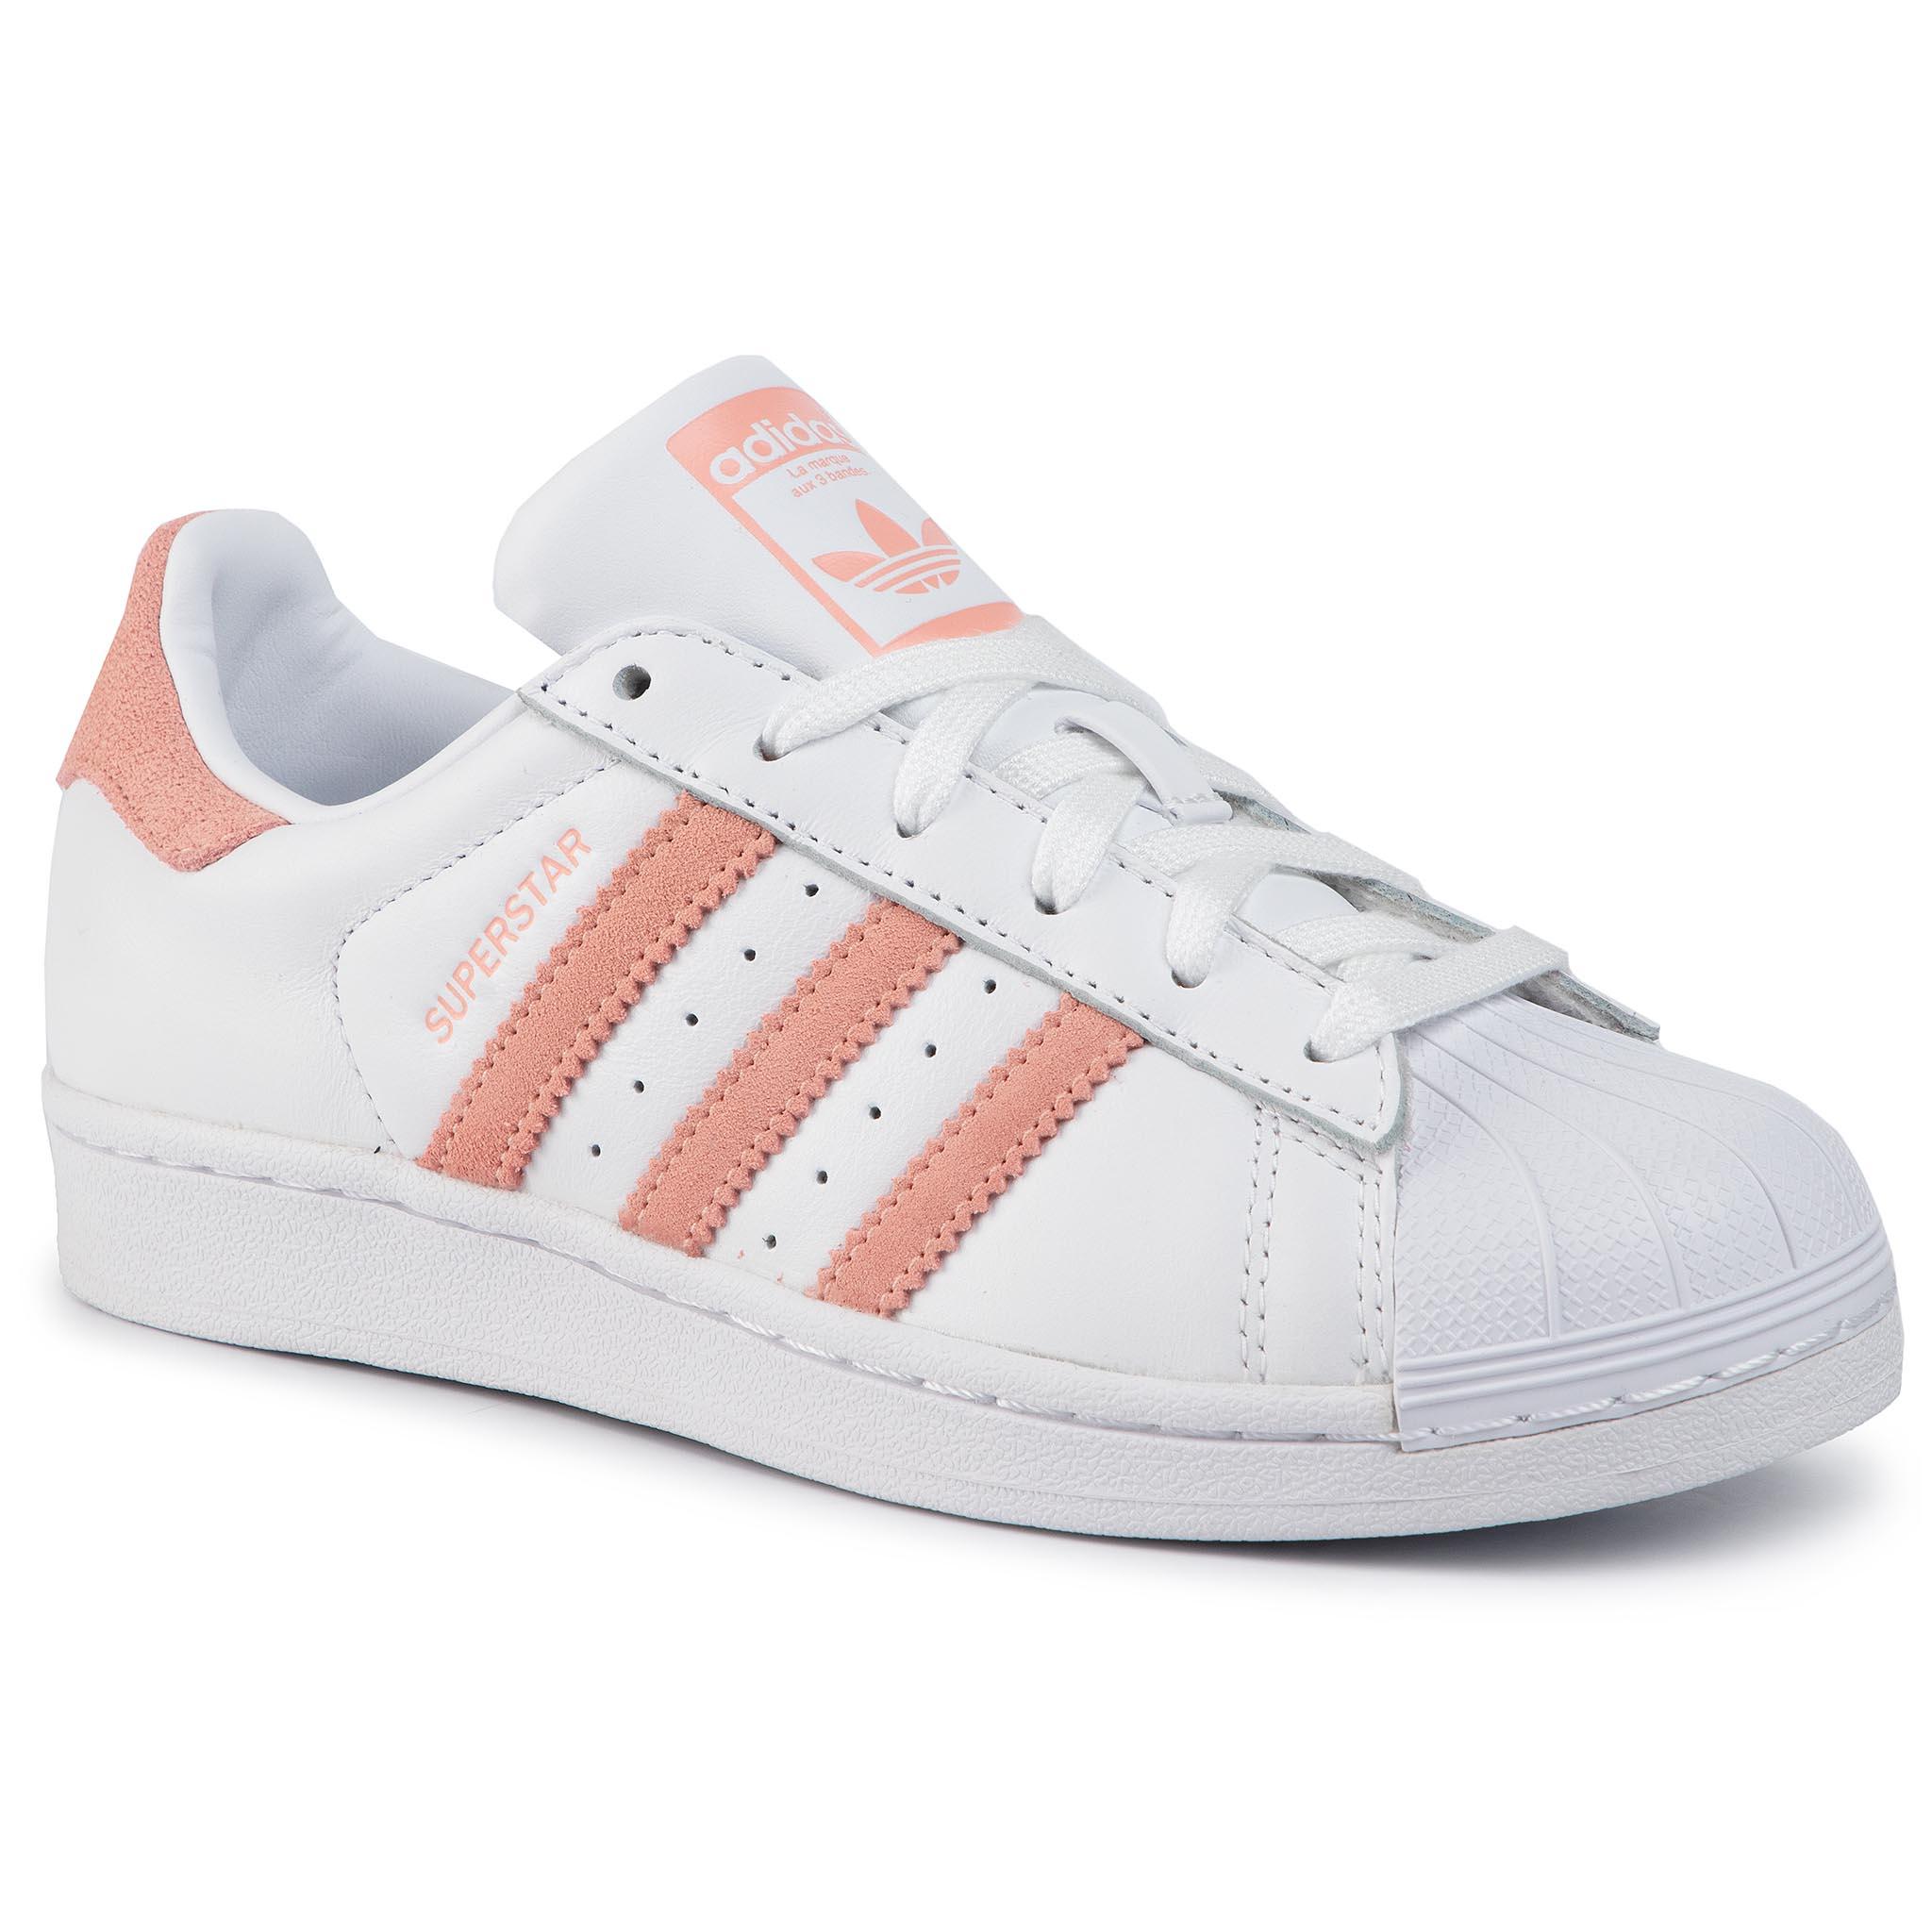 Topánky adidas - Superstar W EF9249 Ftwwht/Glopnk/Cblack